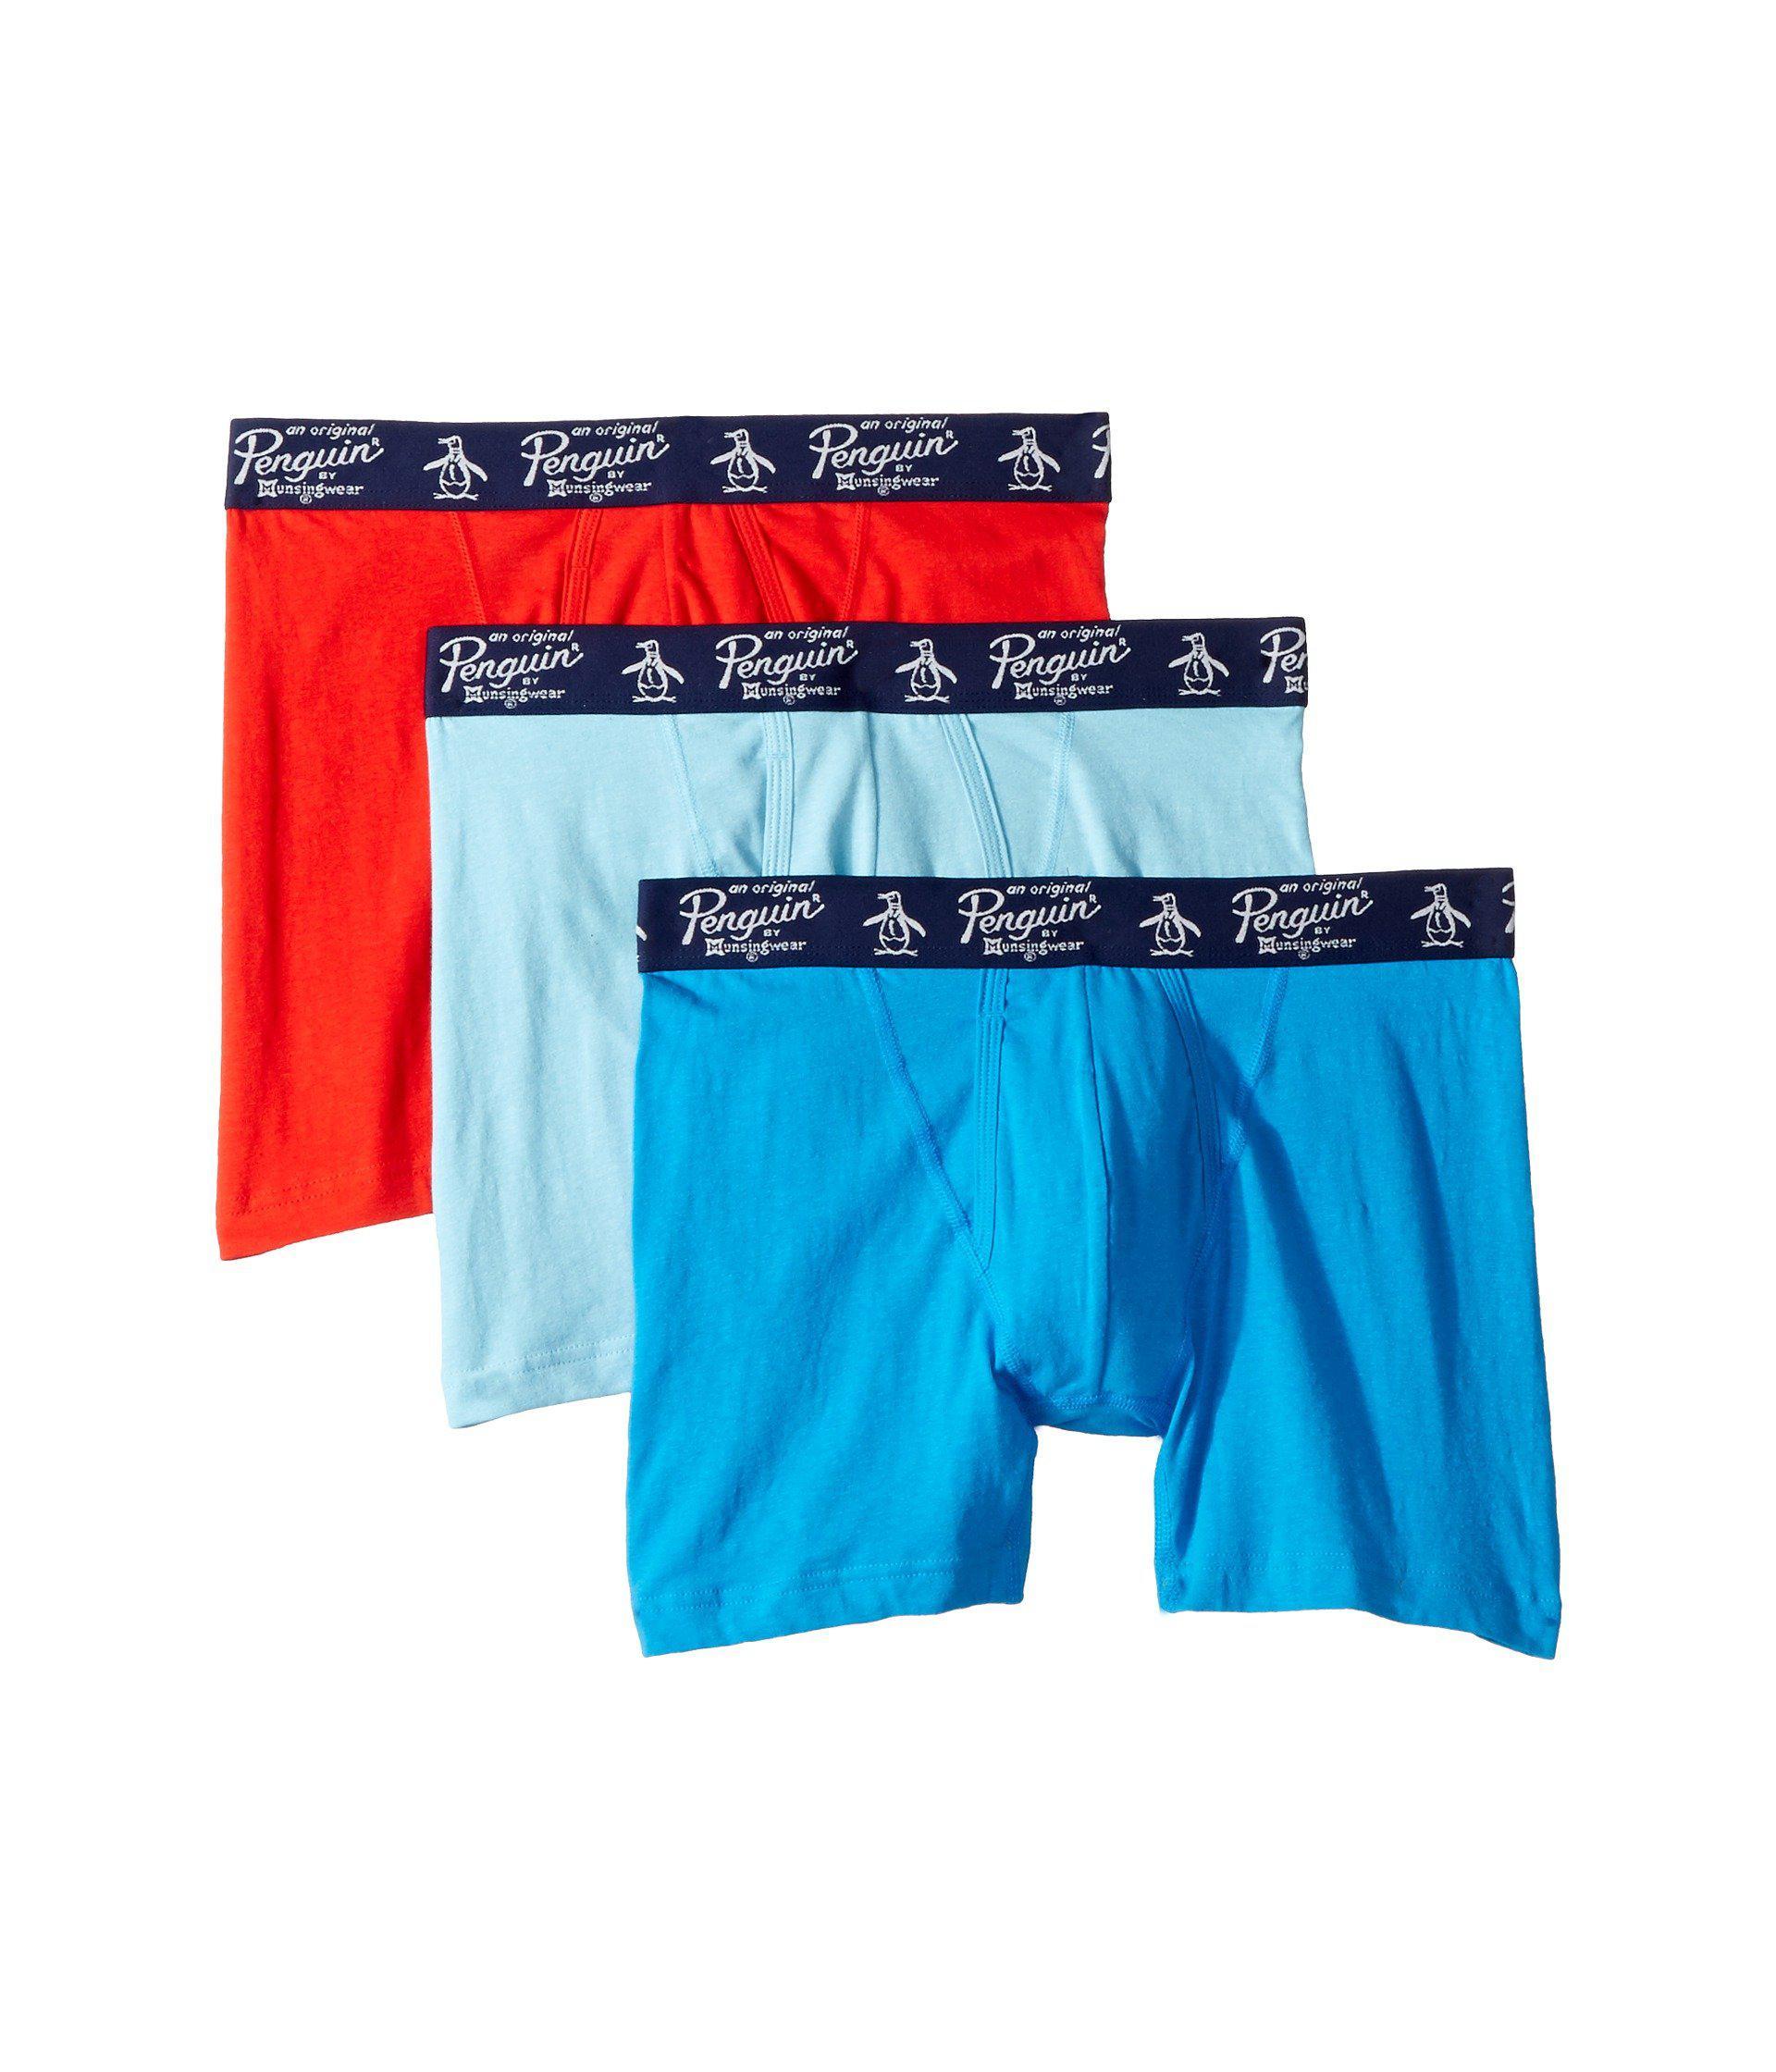 05cb5f8800a7 Original Penguin. Blue 100% Cotton 3 Pack Boxer Brief (black) Men's  Underwear